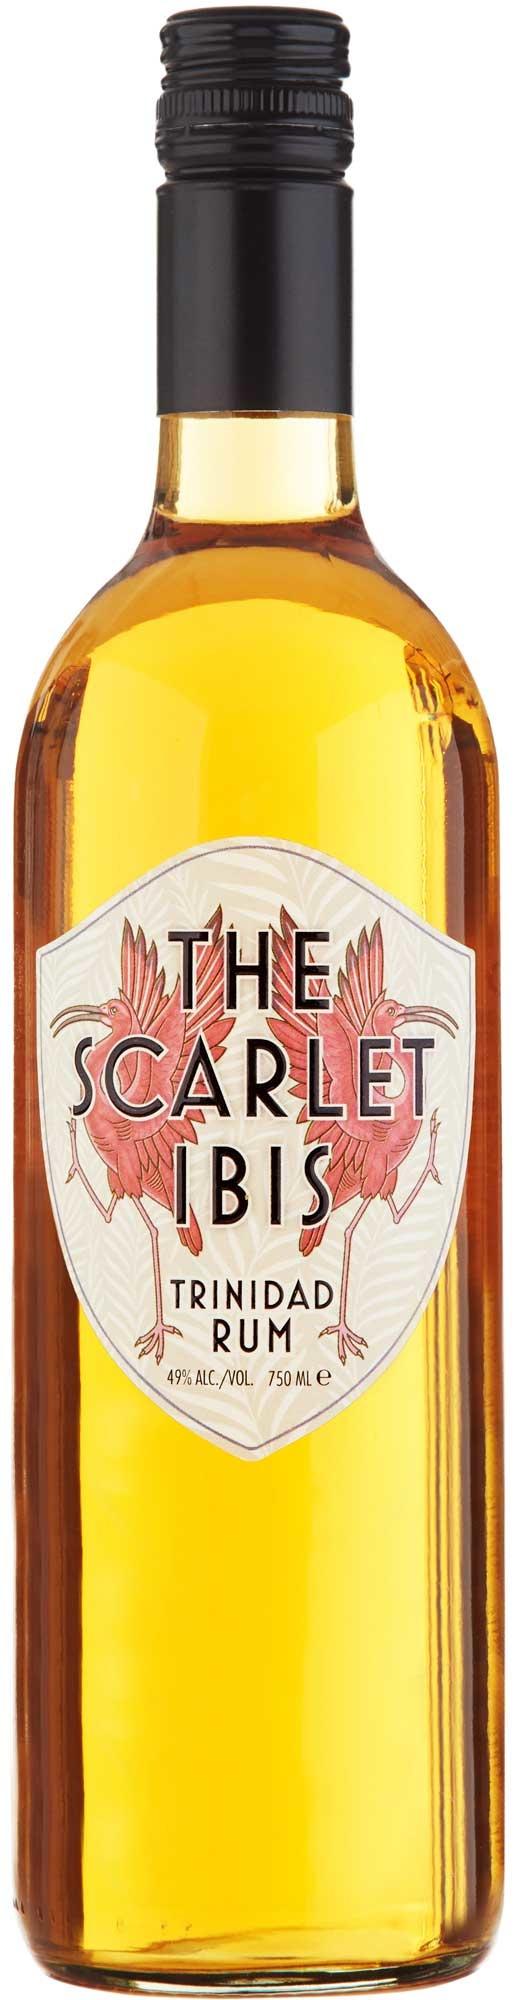 Scarlet Ibis Trinidad Rum 750ml